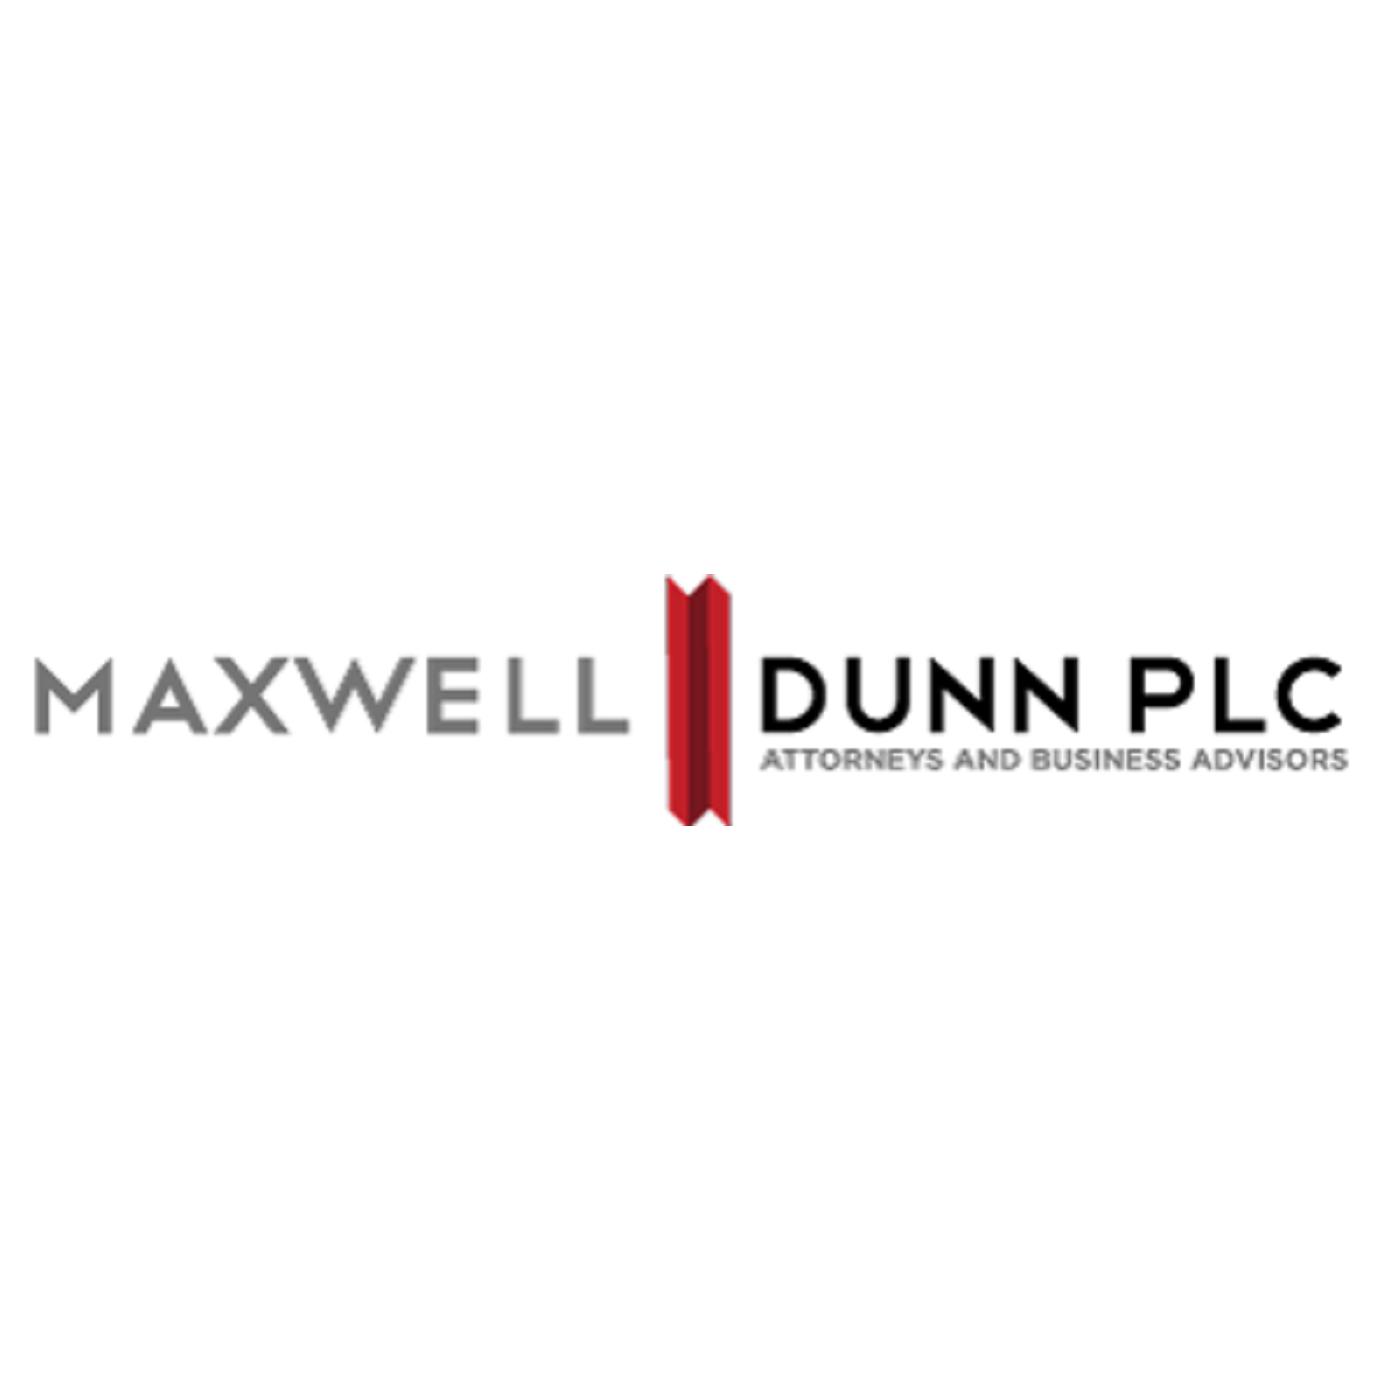 Maxwell Dunn Law - Southfield, MI 48034 - (248)809-1395 | ShowMeLocal.com